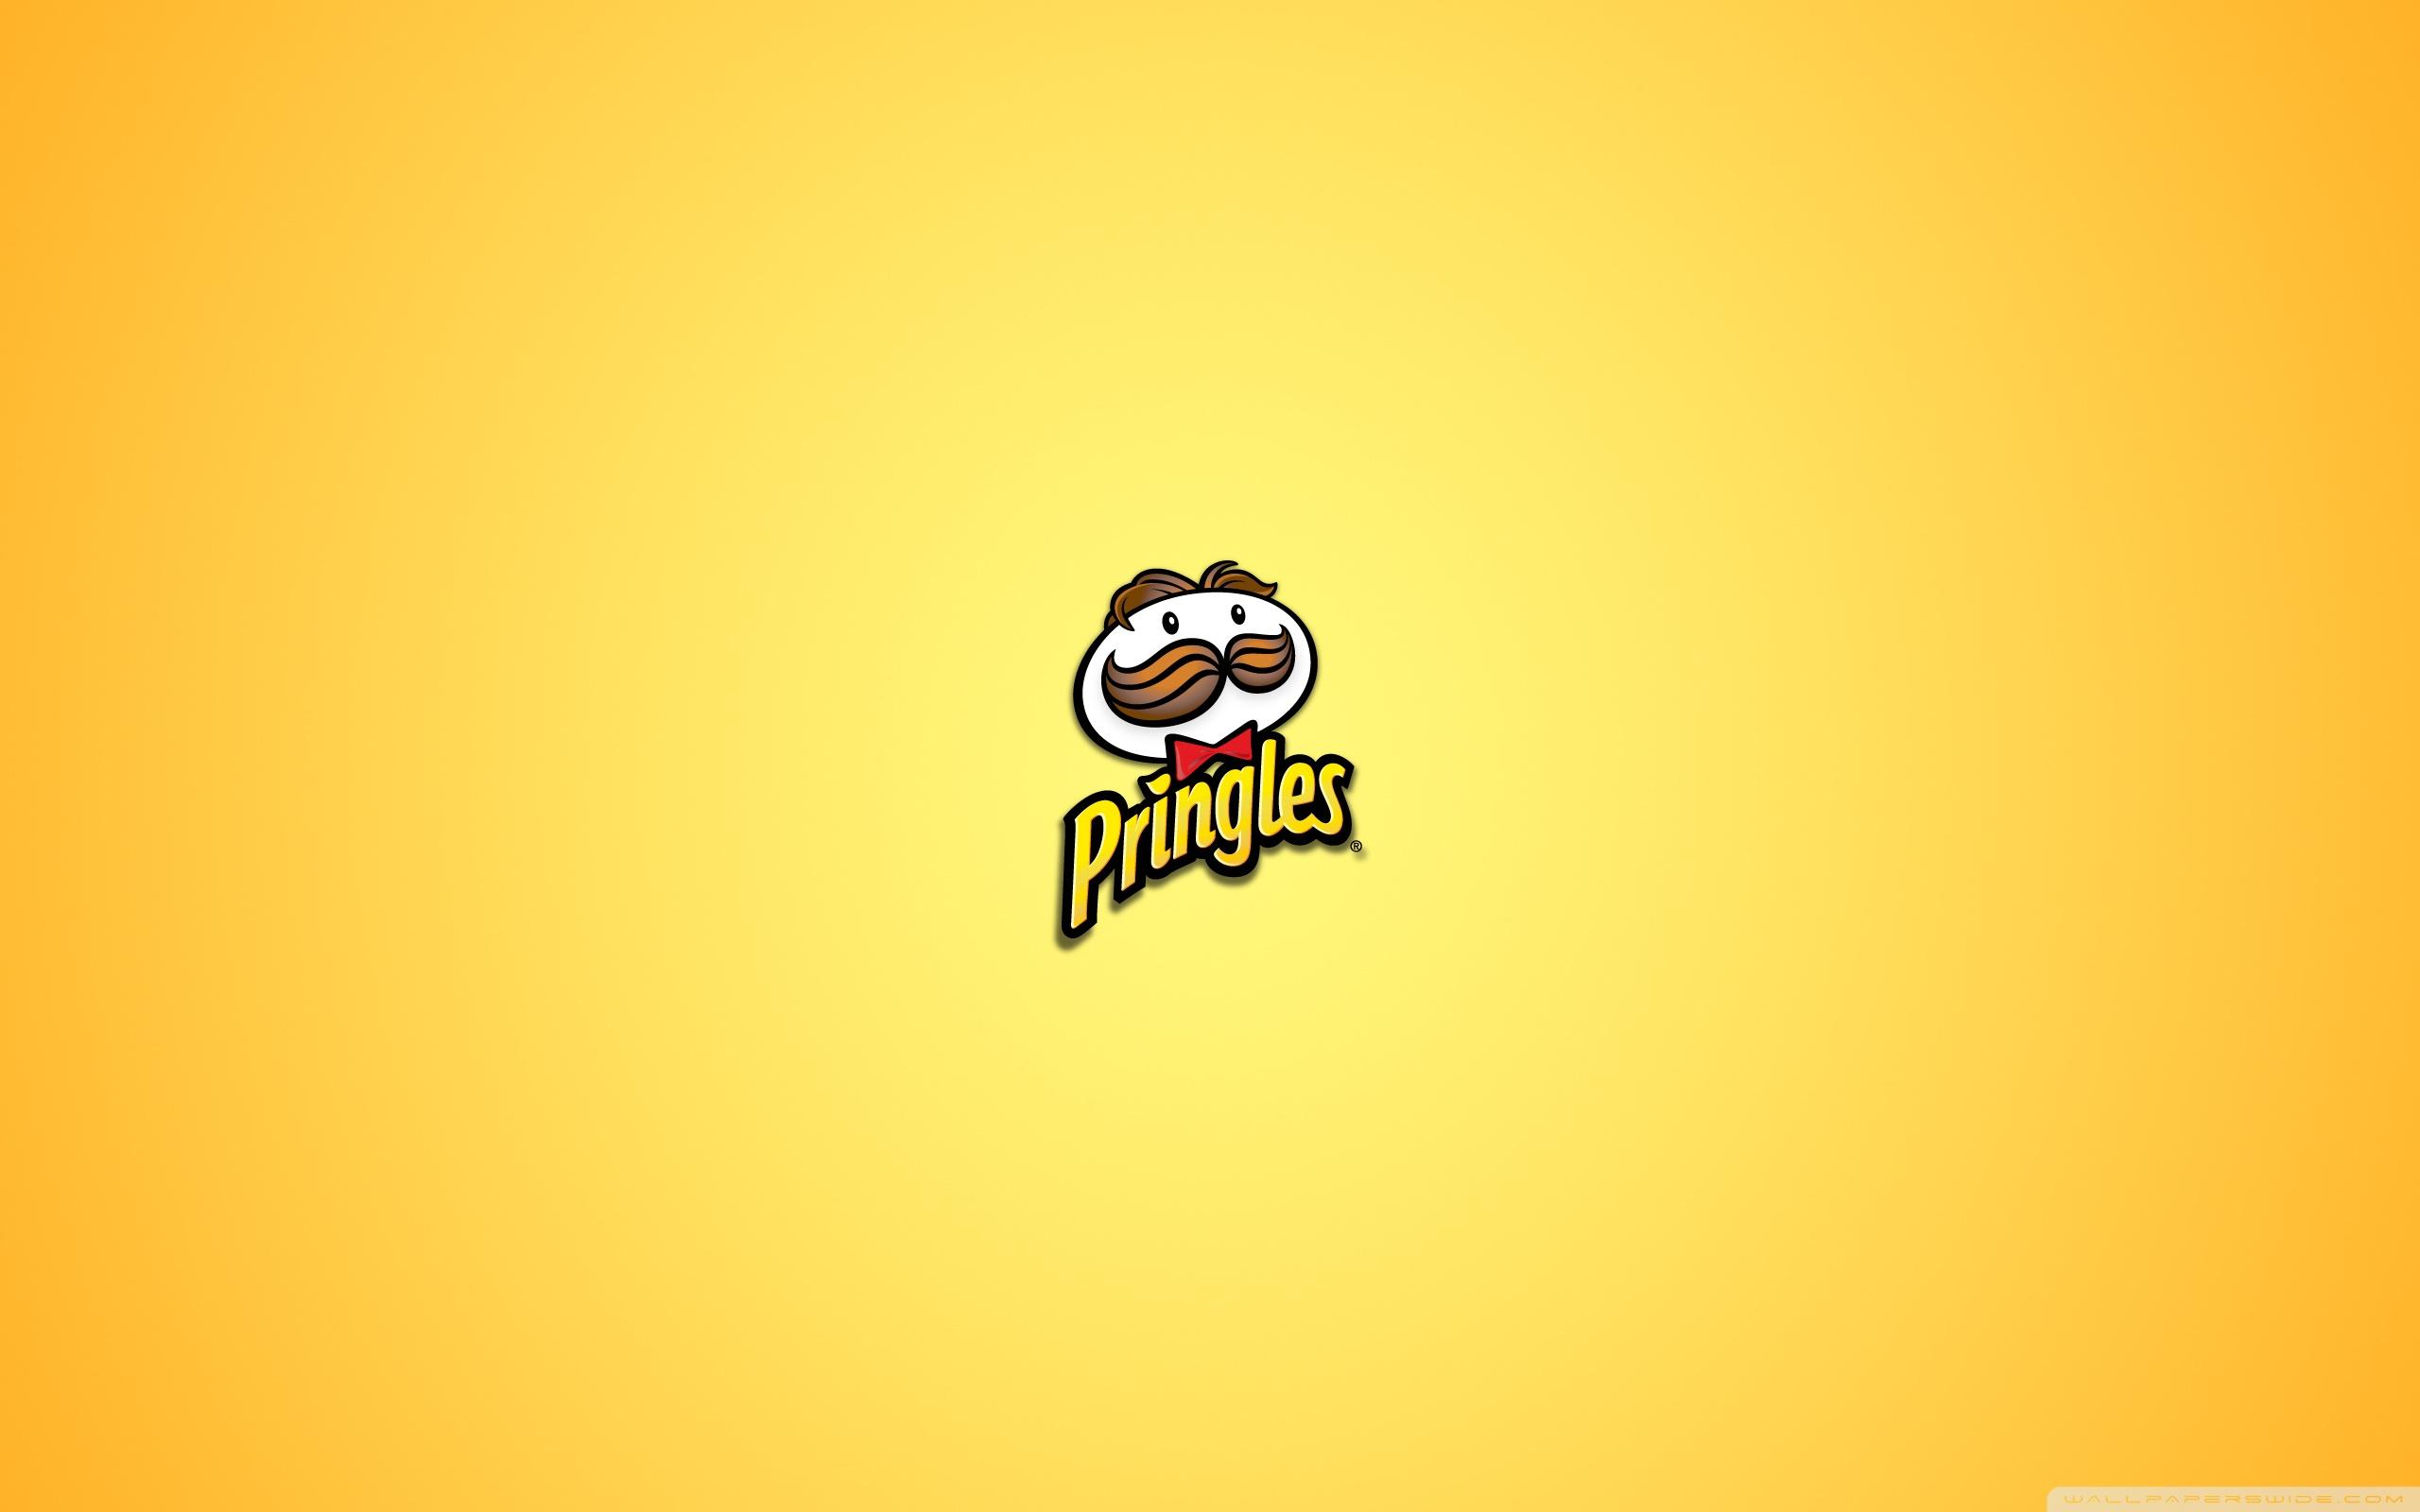 Pringles Guy 4K HD Desktop Wallpaper for 4K Ultra HD TV Dual 2560x1600